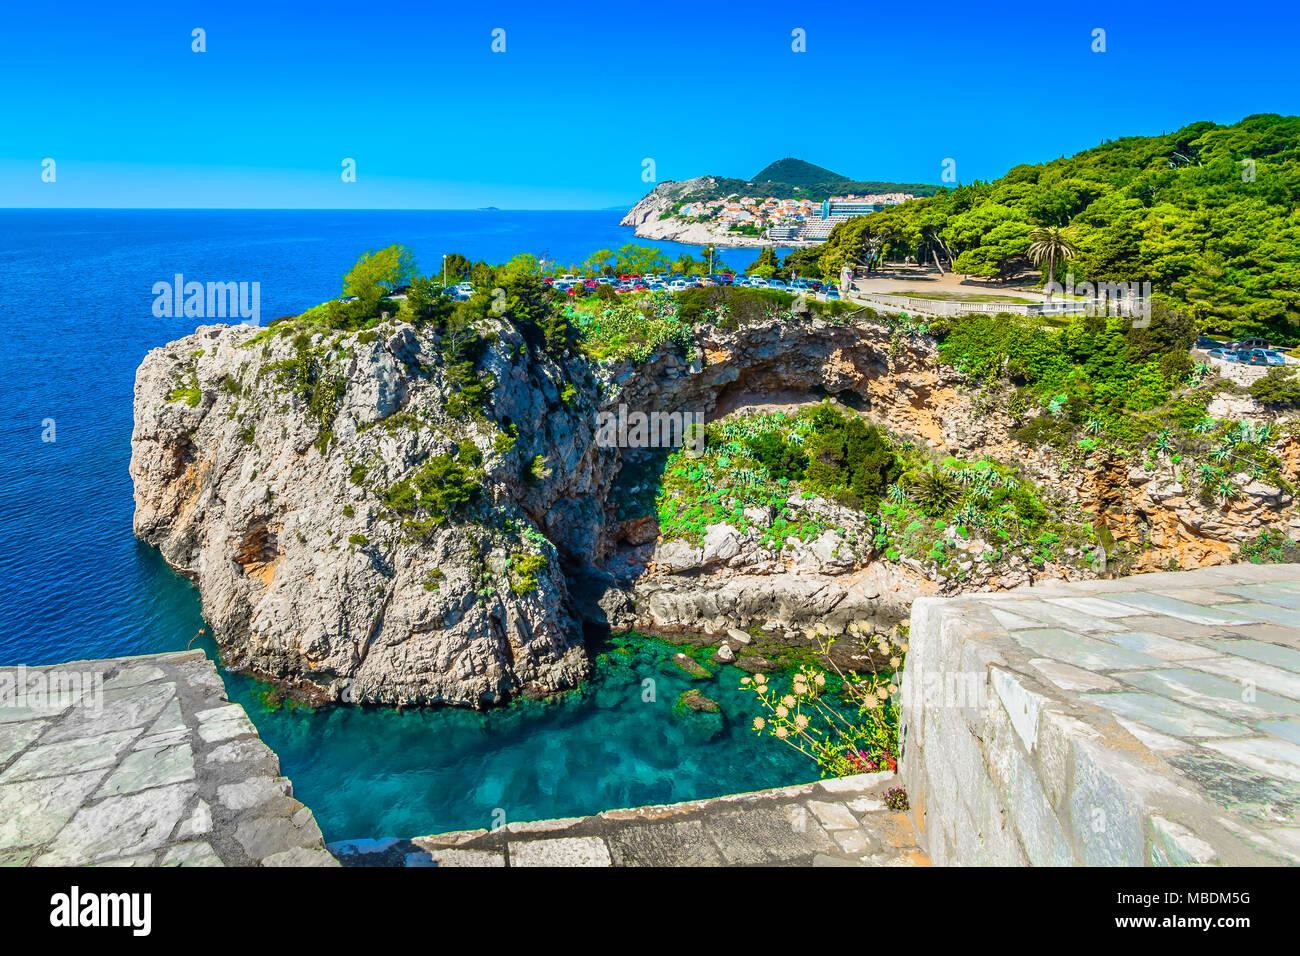 Scenic view at marble mediterranean coast and sea in Dubrovnik, Croatia. Stock Photo